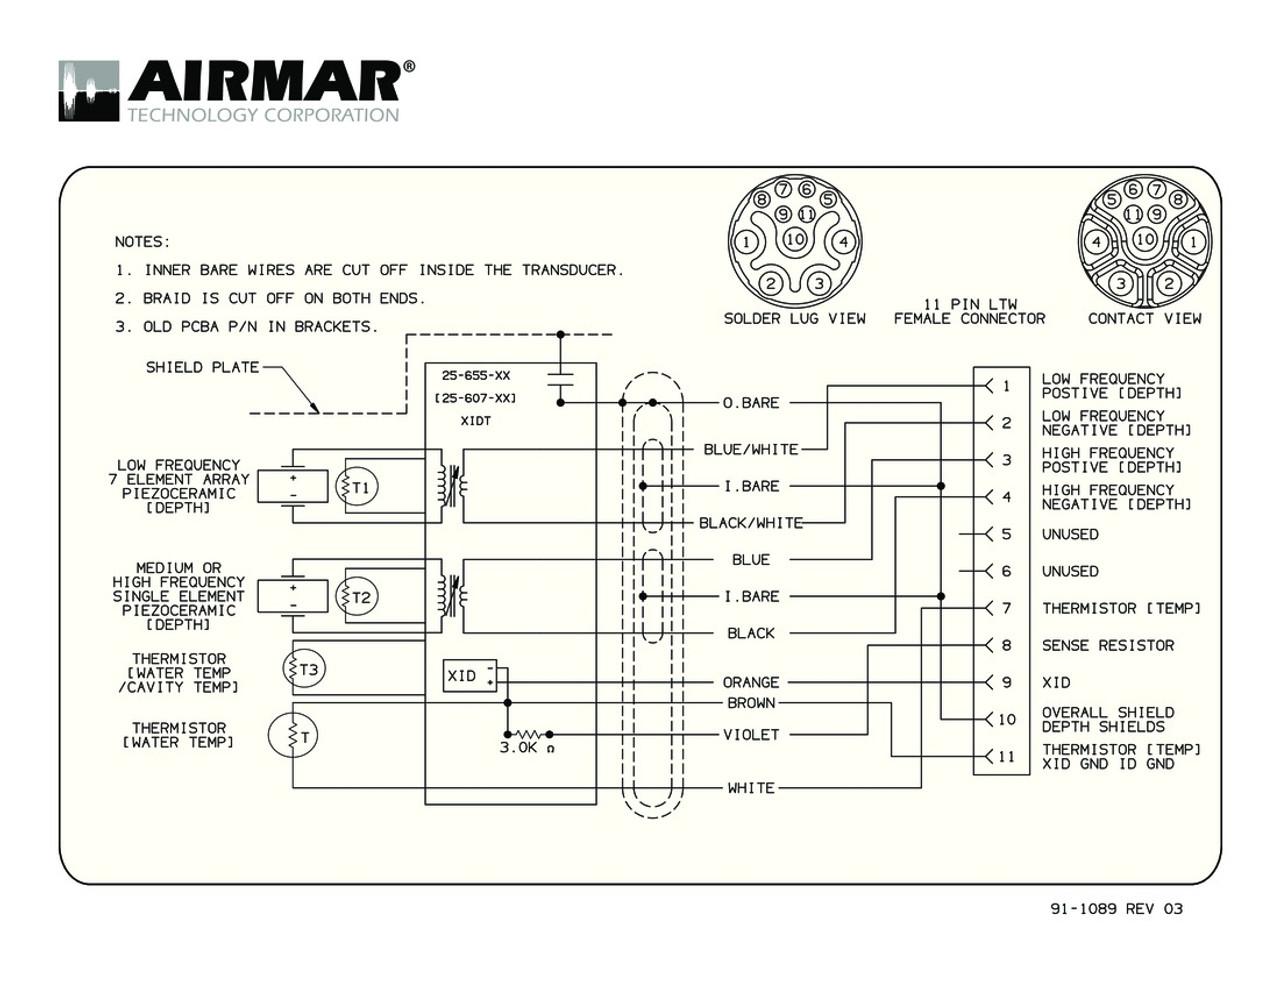 medium resolution of  hubbell airmar wiring diagram tm265 blue bottle marine on pioneer wiring diagrams garmin wiring diagrams airmar wiring diagram raymarine